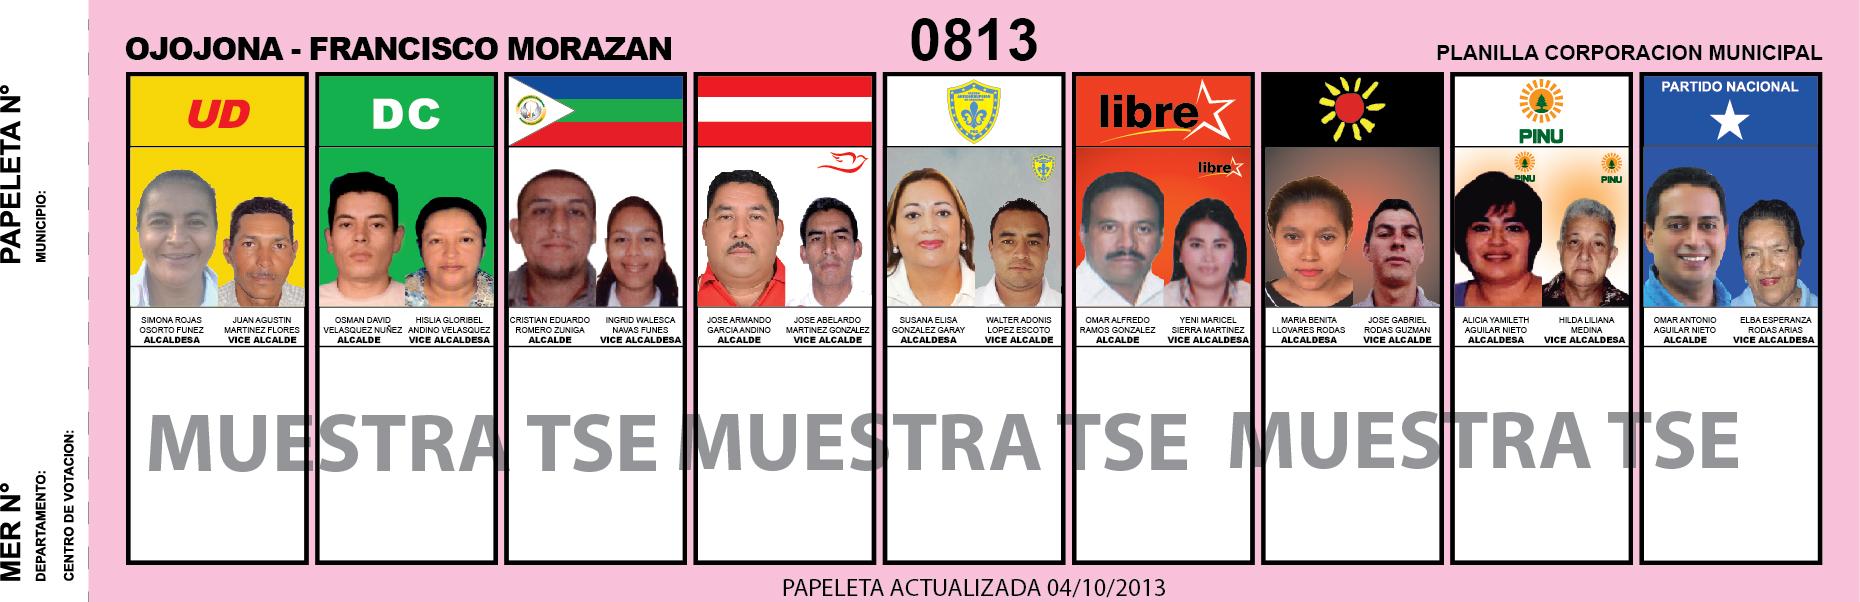 CANDIDATOS 2013 MUNICIPIO OJOJONA - FRANCISCO MORAZAN - HONDURAS